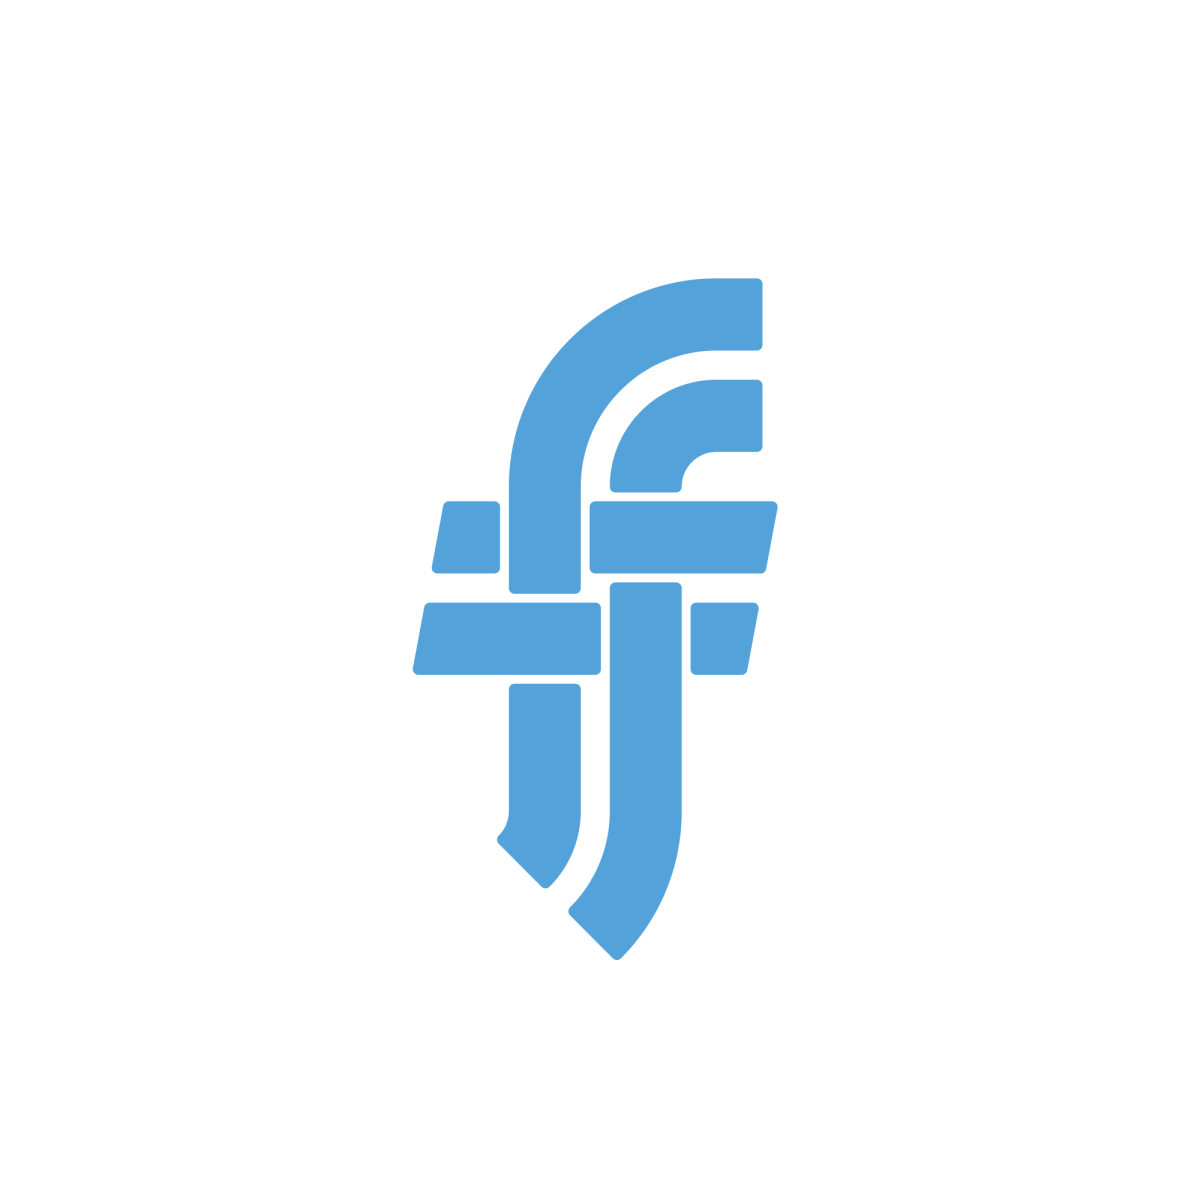 Flannel Logo Letter Logo Lettering Letter F